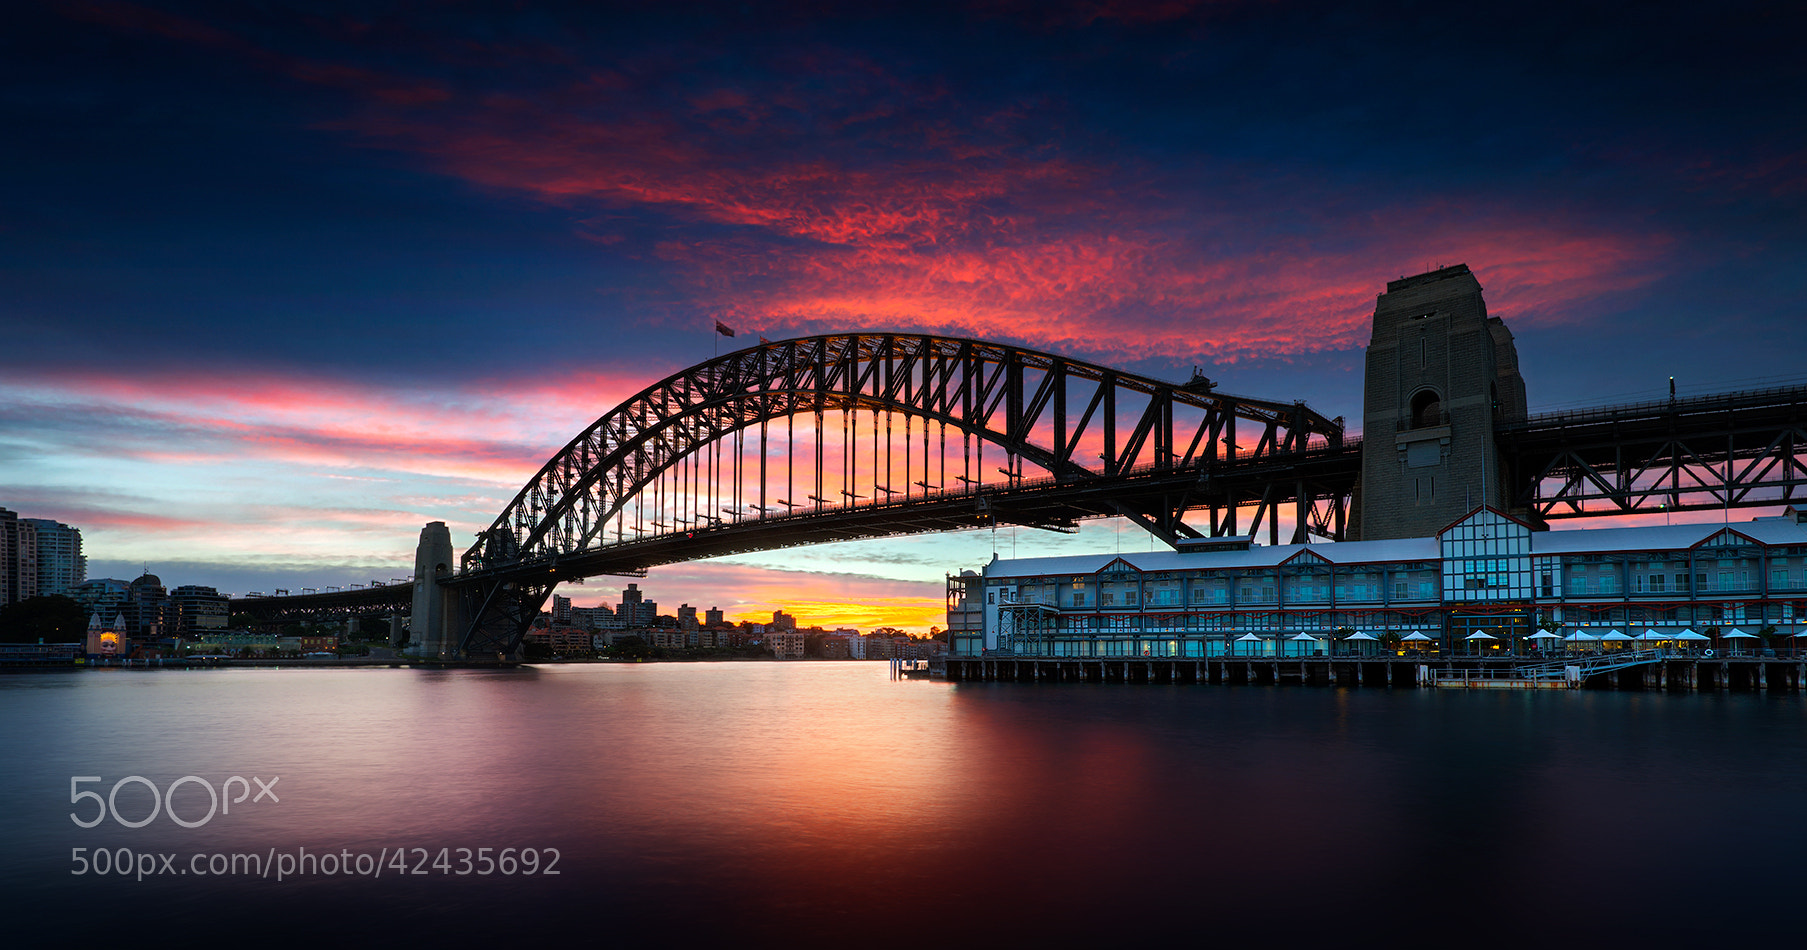 Photograph Sydney Habour bridge #3 by Goff Kitsawad on 500px